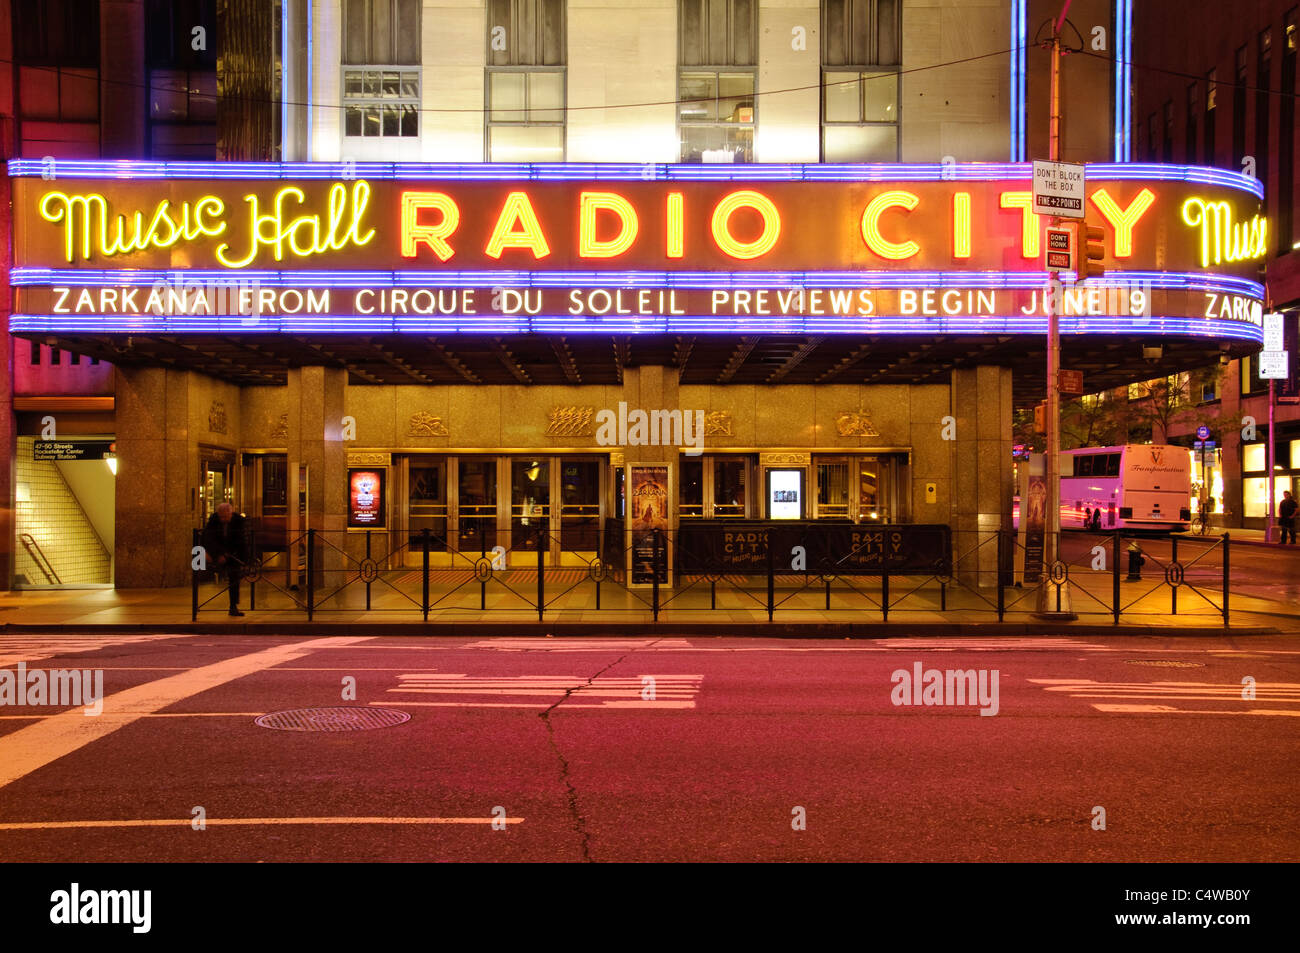 Radio City Musical Hall, Avenue of the Americas, New York City, 2011 - Stock Image